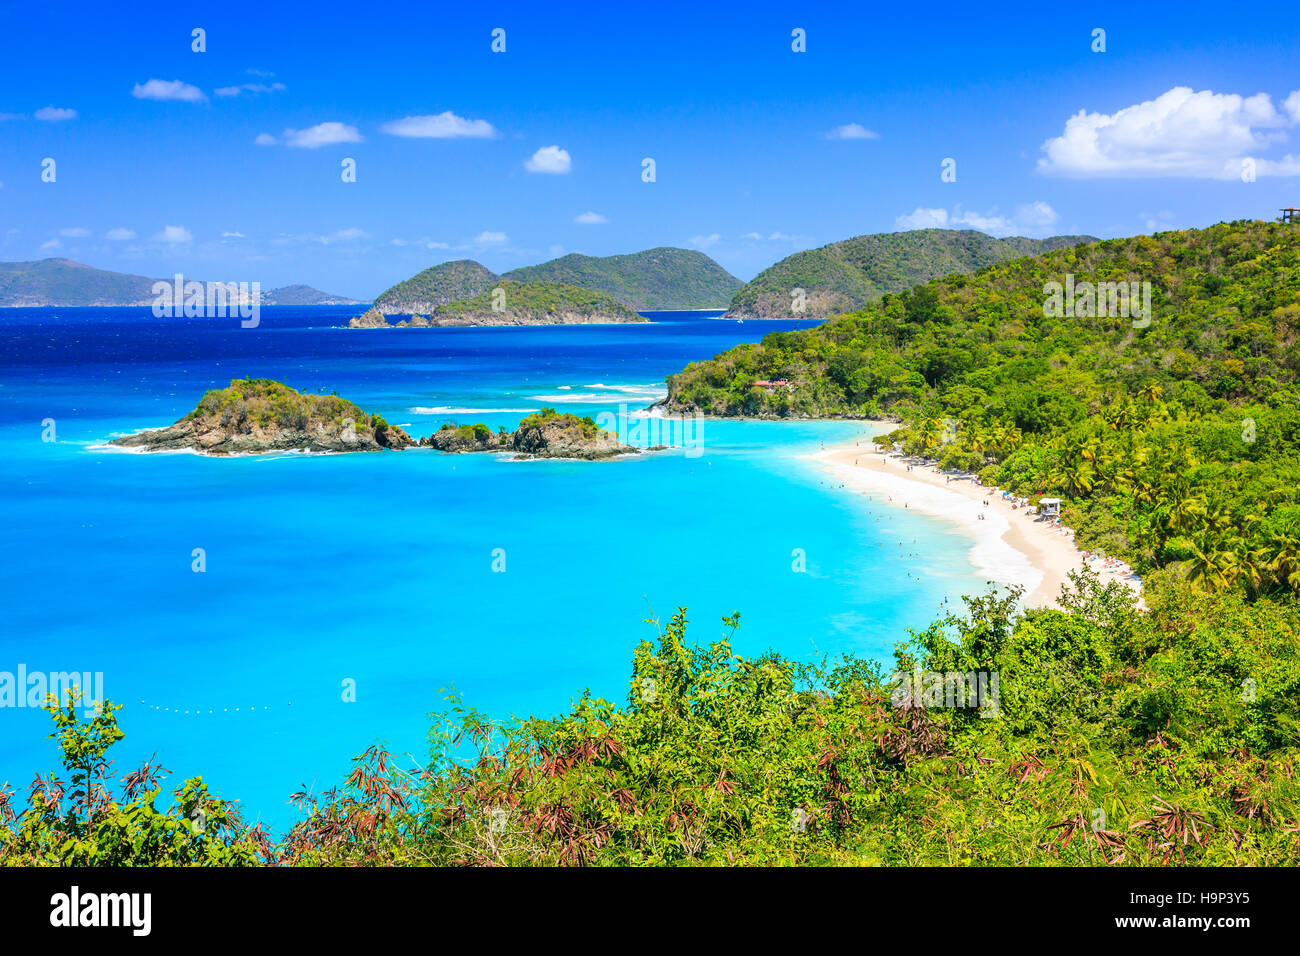 Karibik, Trunk Bay auf der Insel St. John, US Virgin Islands Stockbild